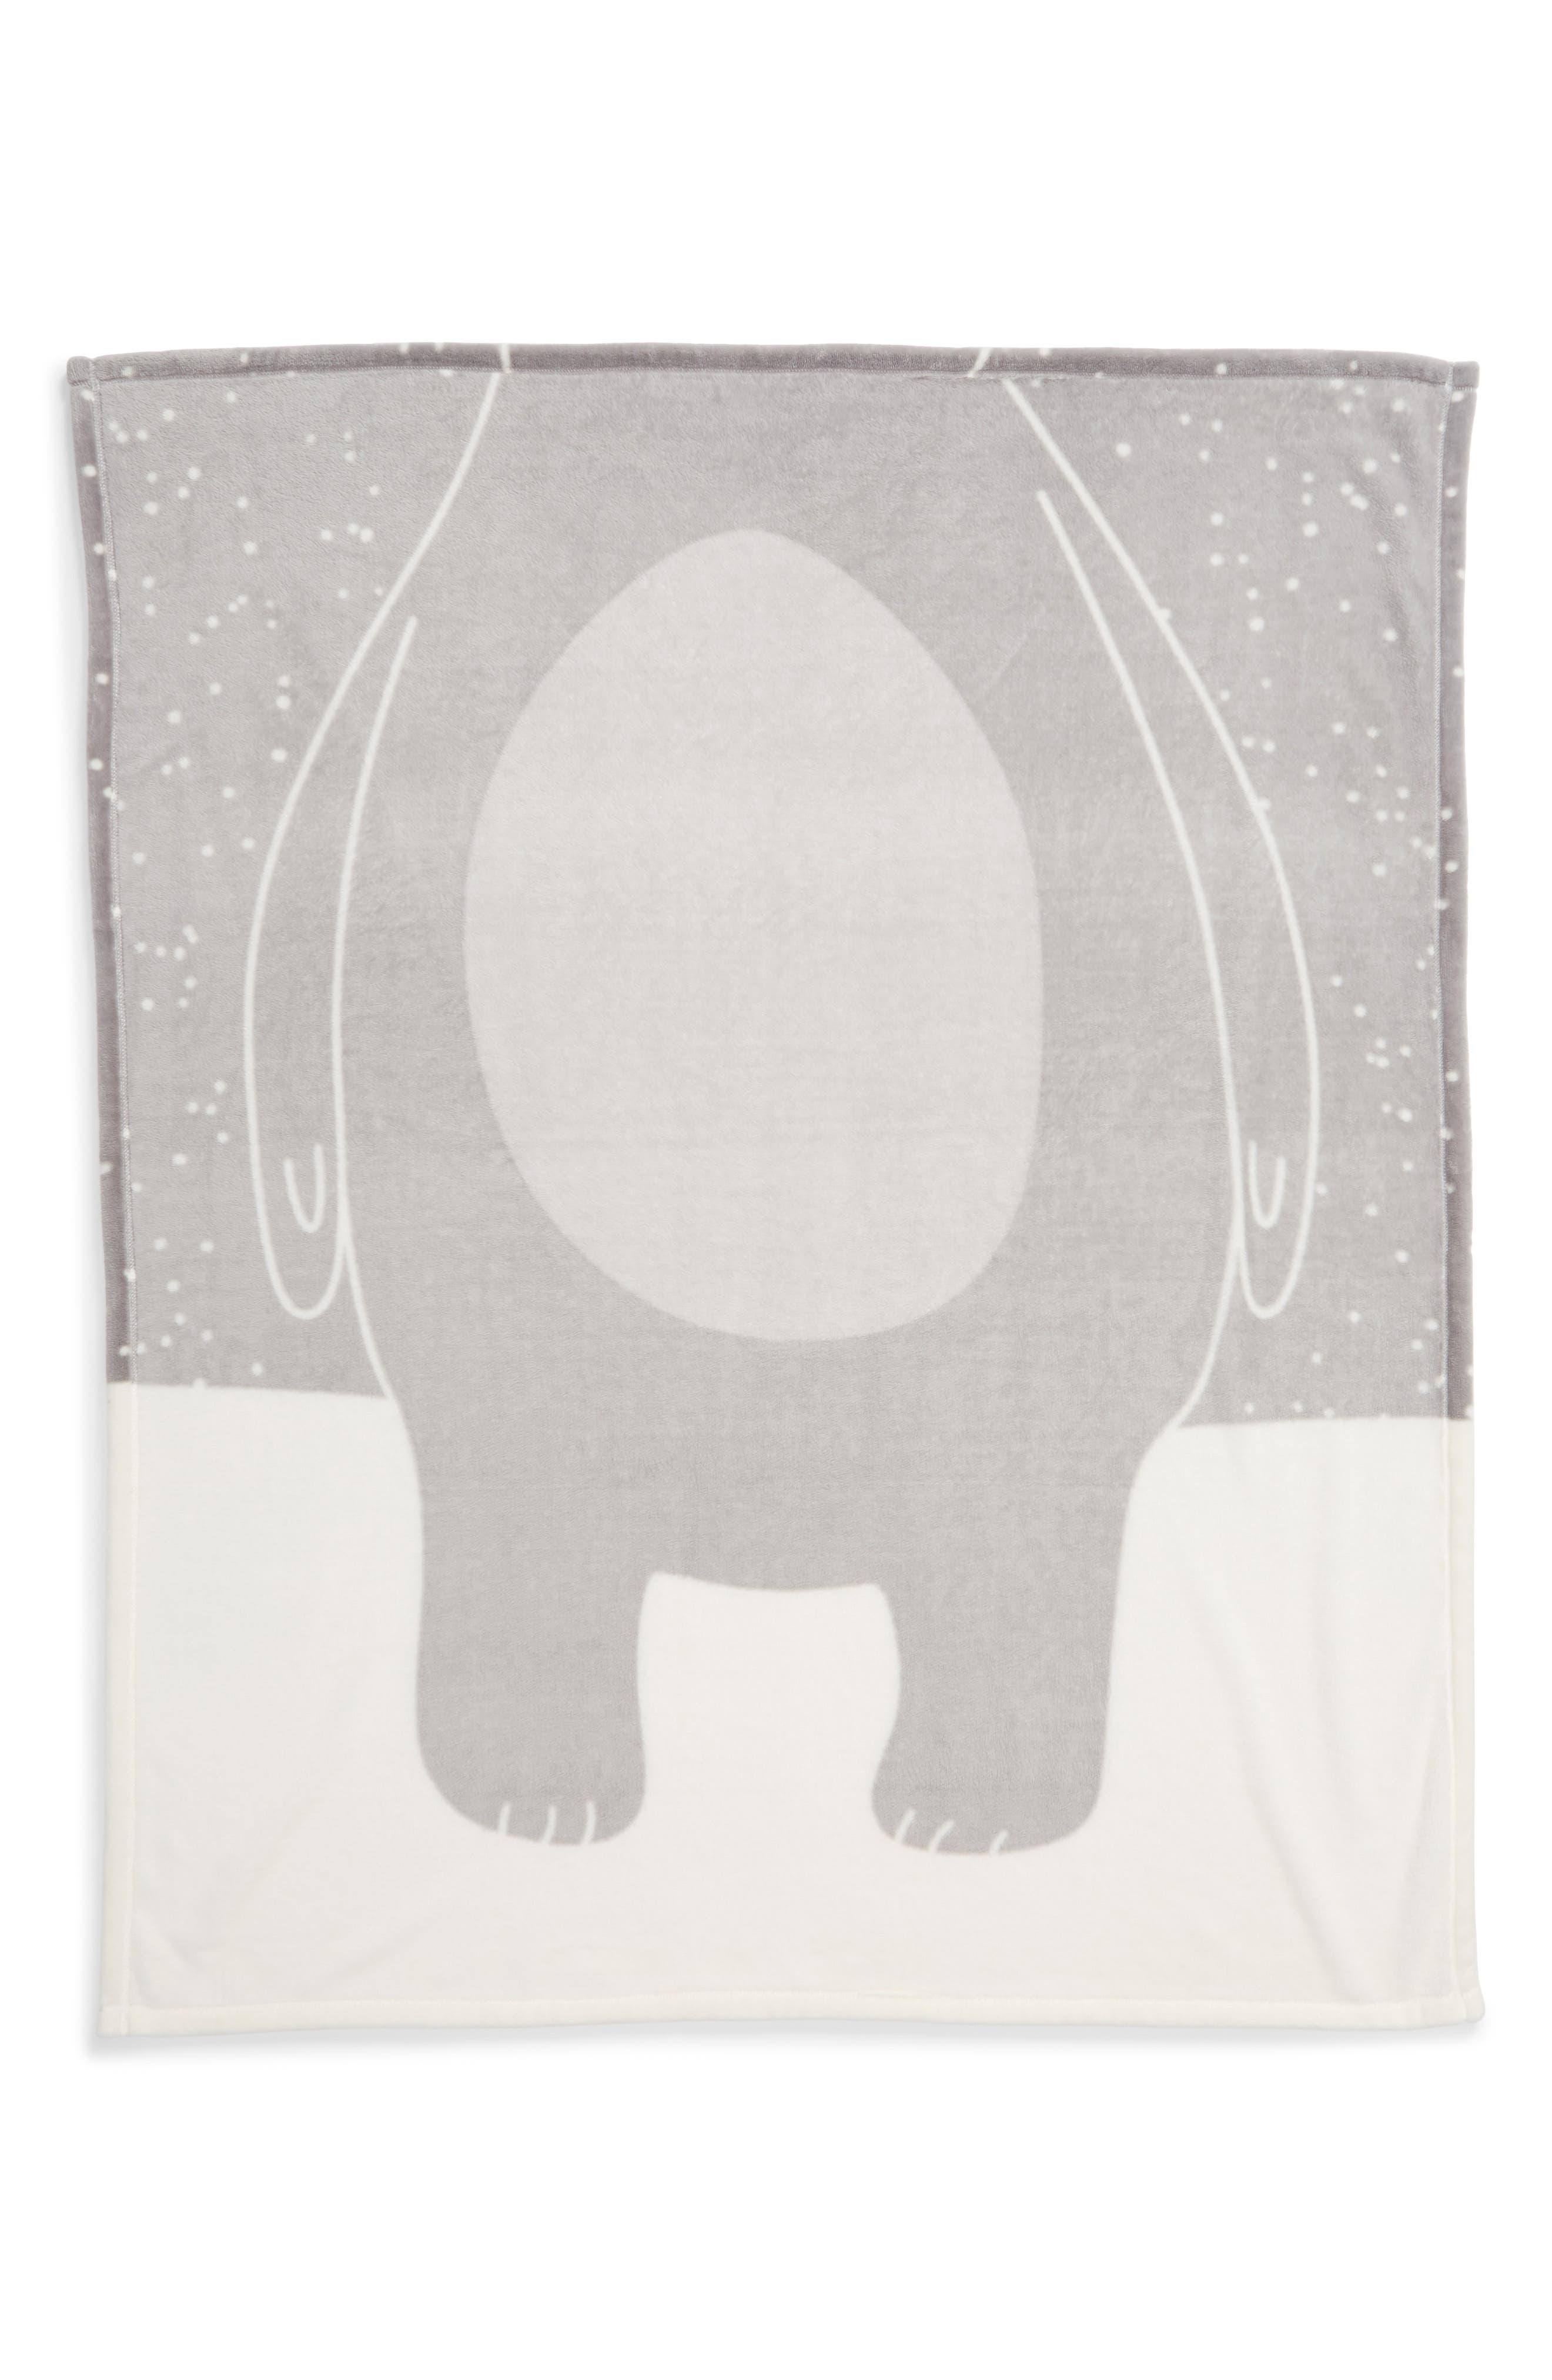 Bear Suit Plush Throw,                             Alternate thumbnail 2, color,                             GREY VAPOR BEAR